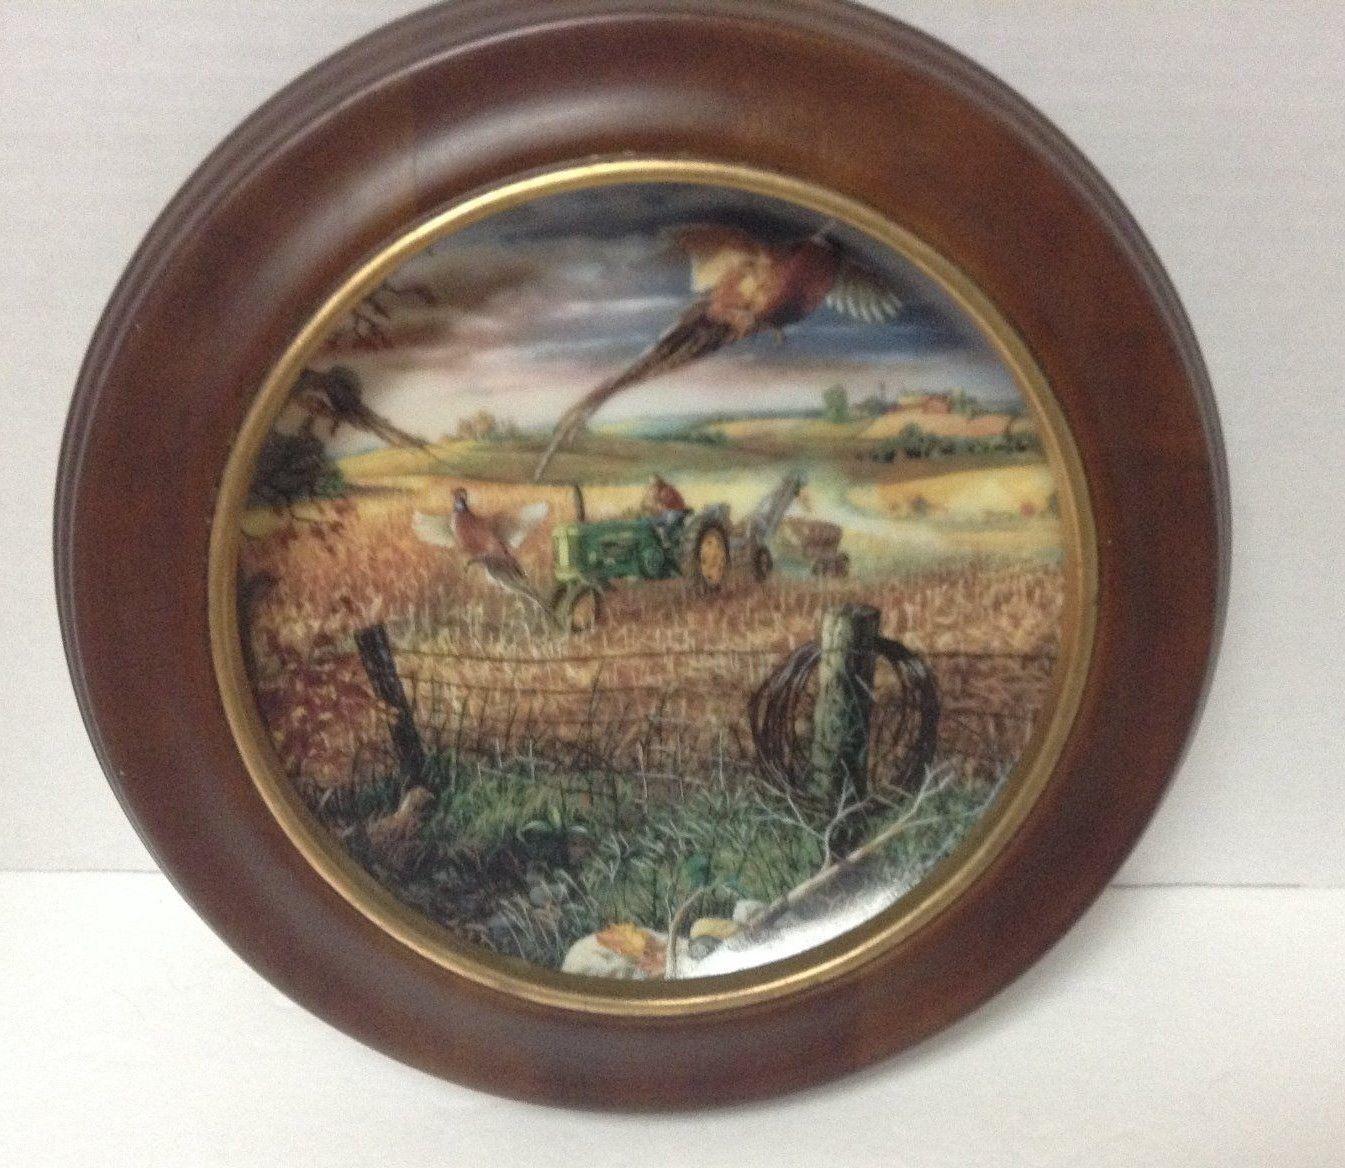 Autumn Harvest Life Farm Limited Edition John Deere Wood Framed Plate C3781